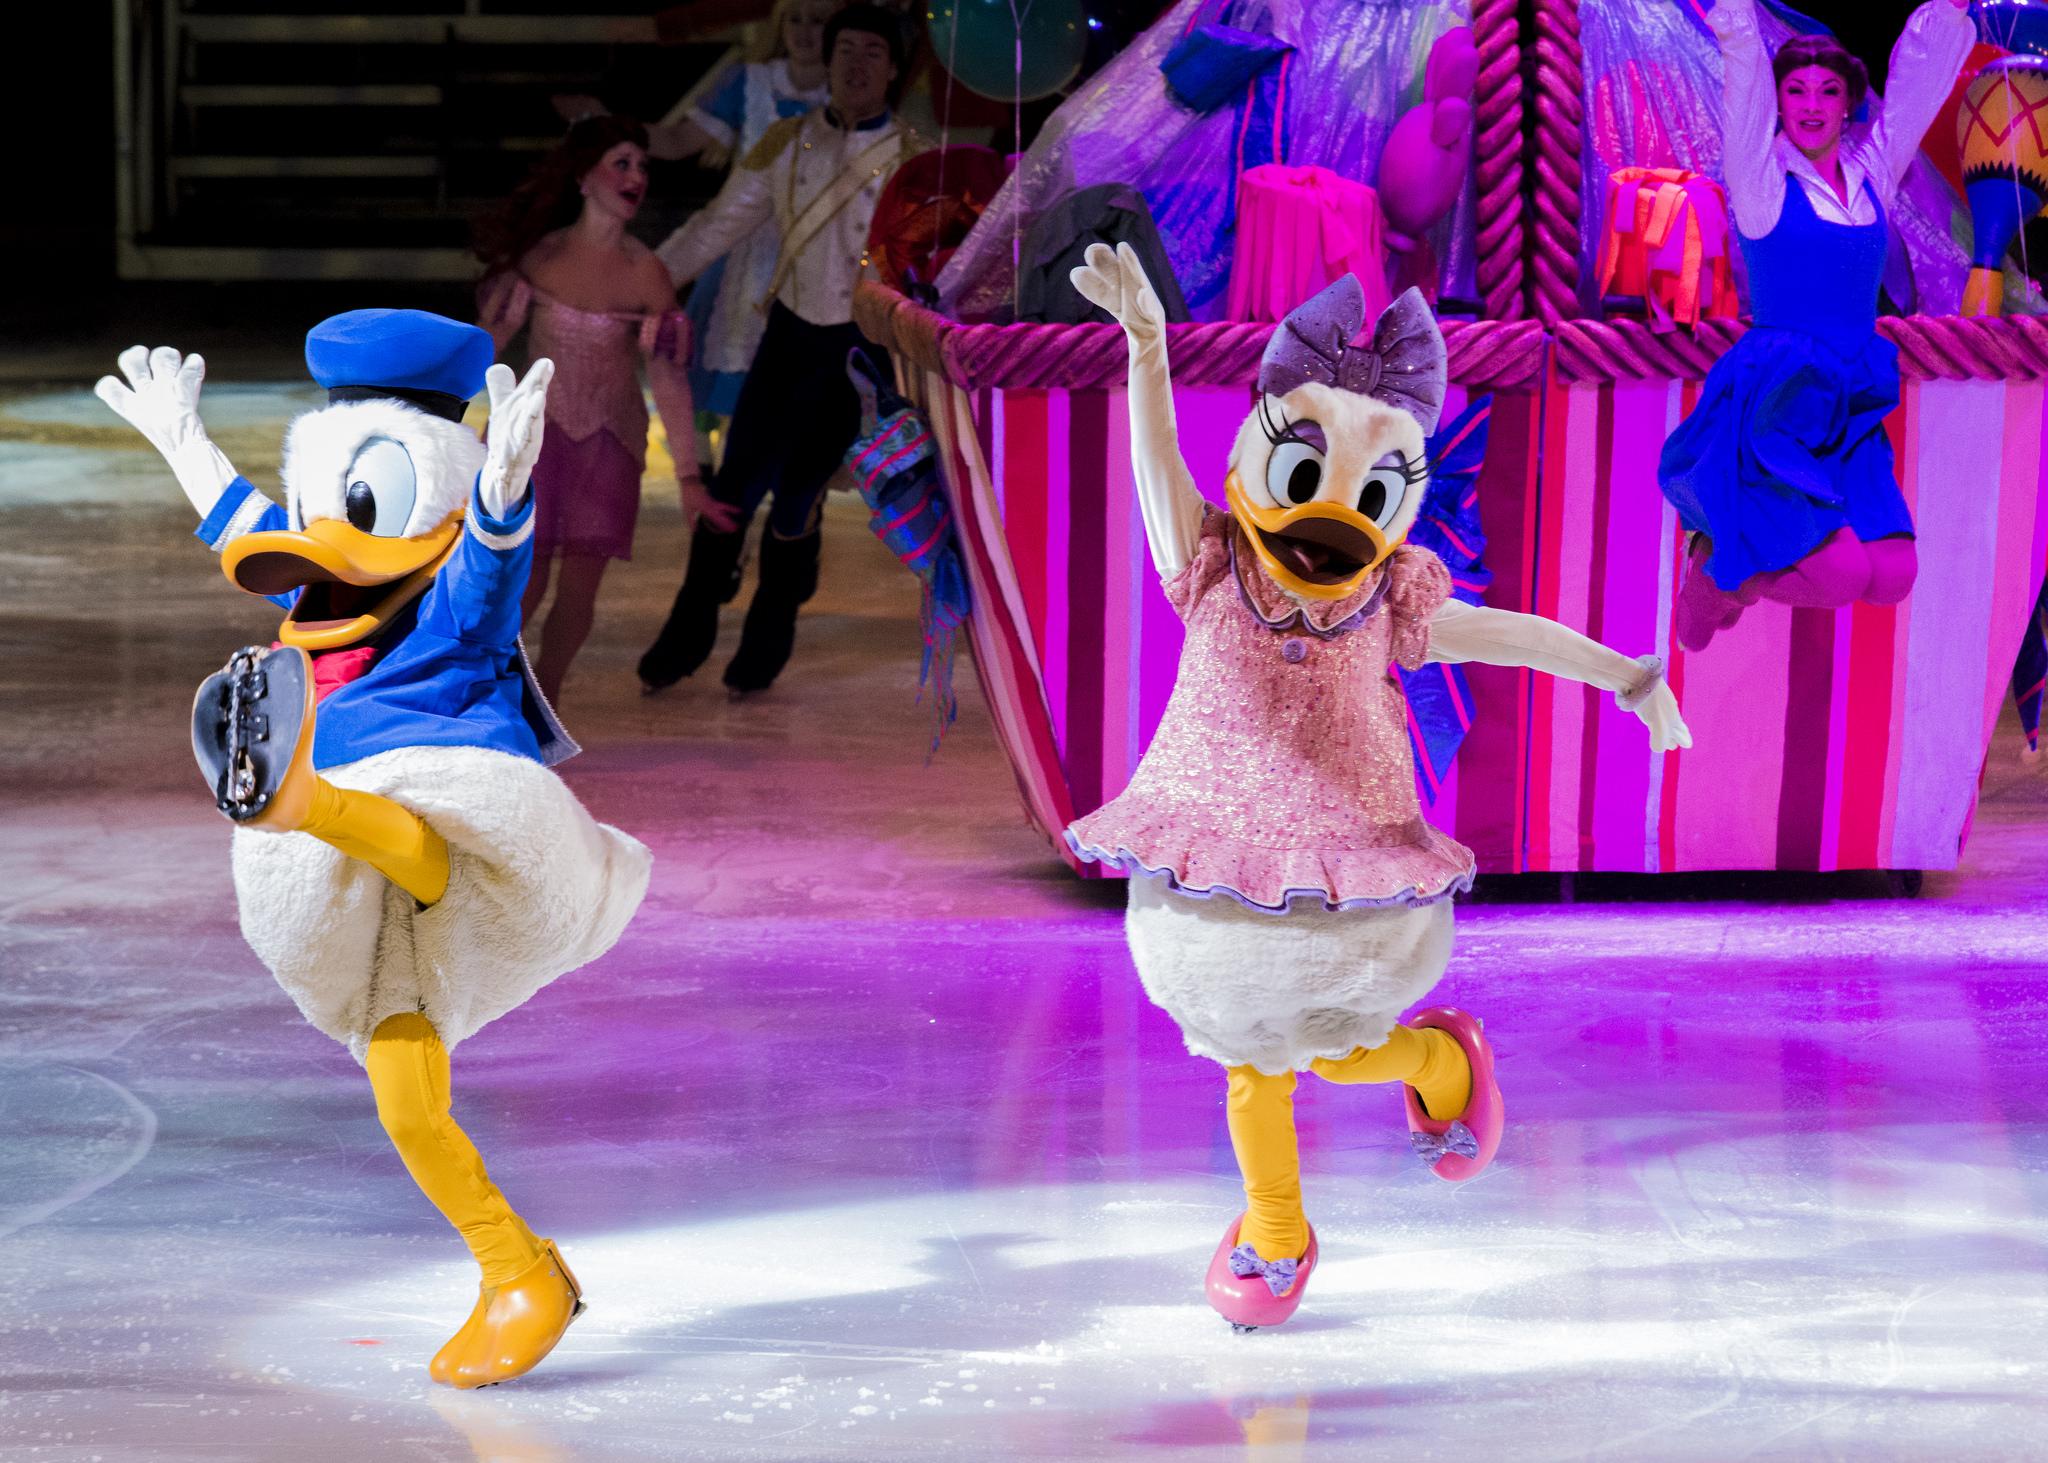 Disney on Ice - Fotocredits: Hubert Yu (CC Flickr)